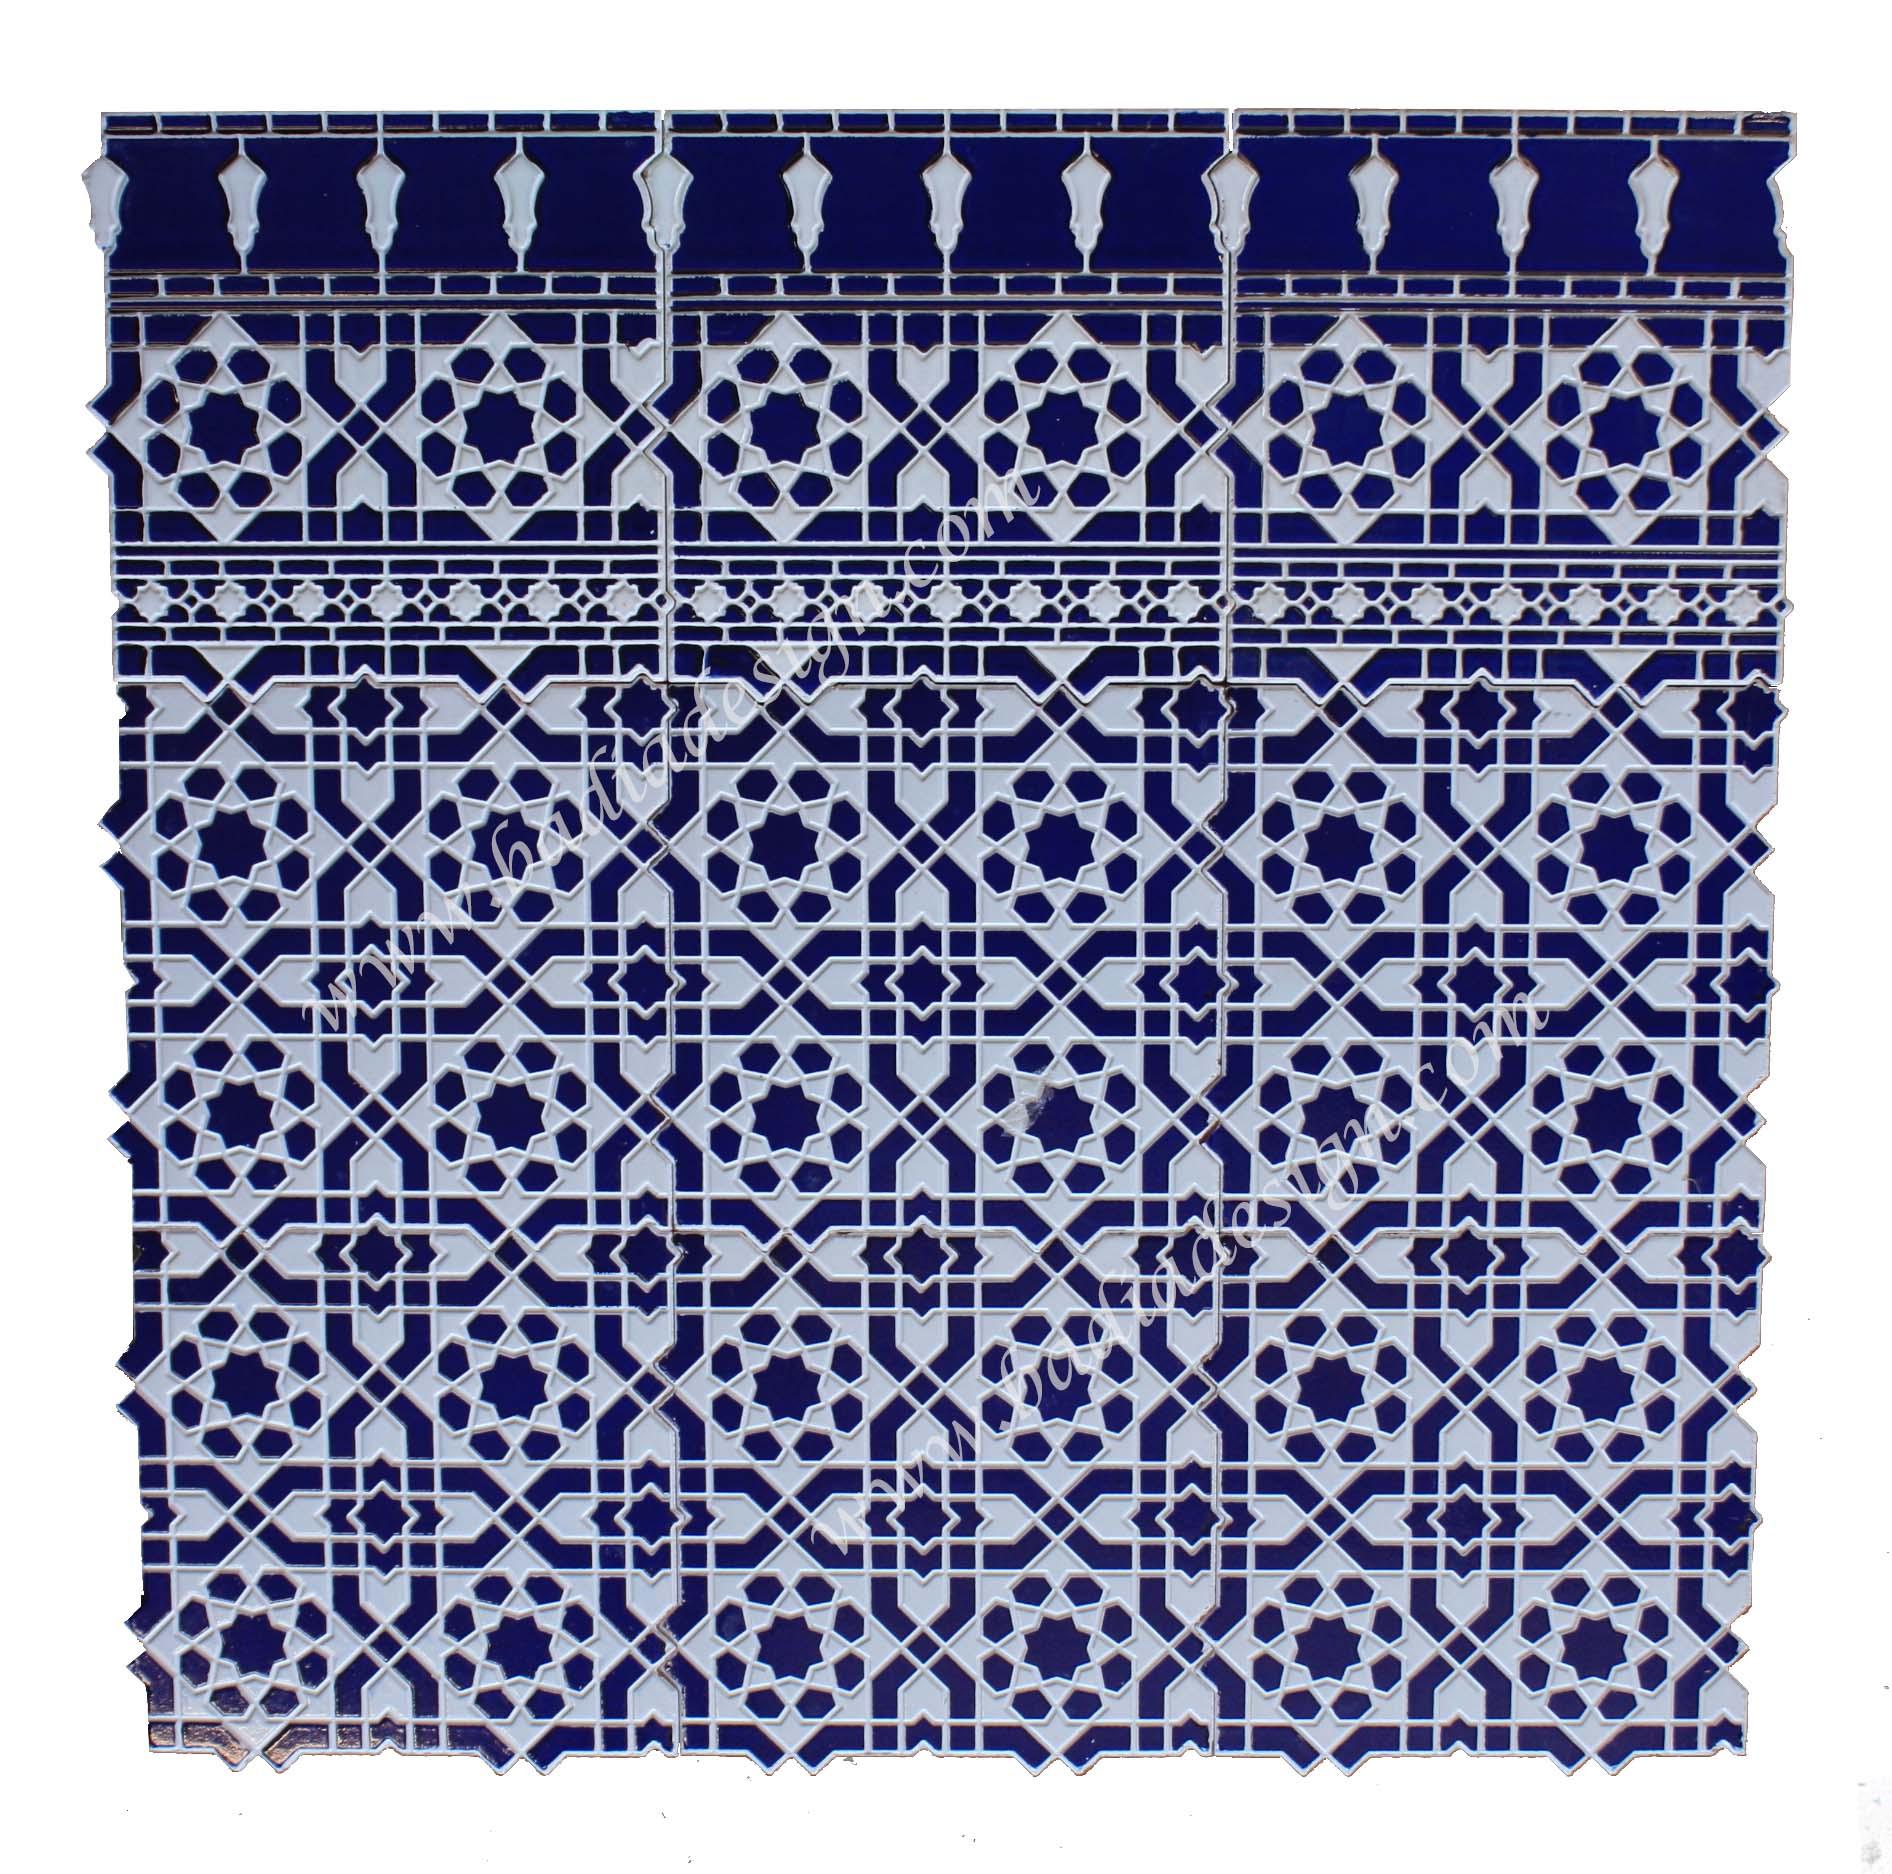 moroccan-ceramic-fez-file-ft016-1-1.jpg